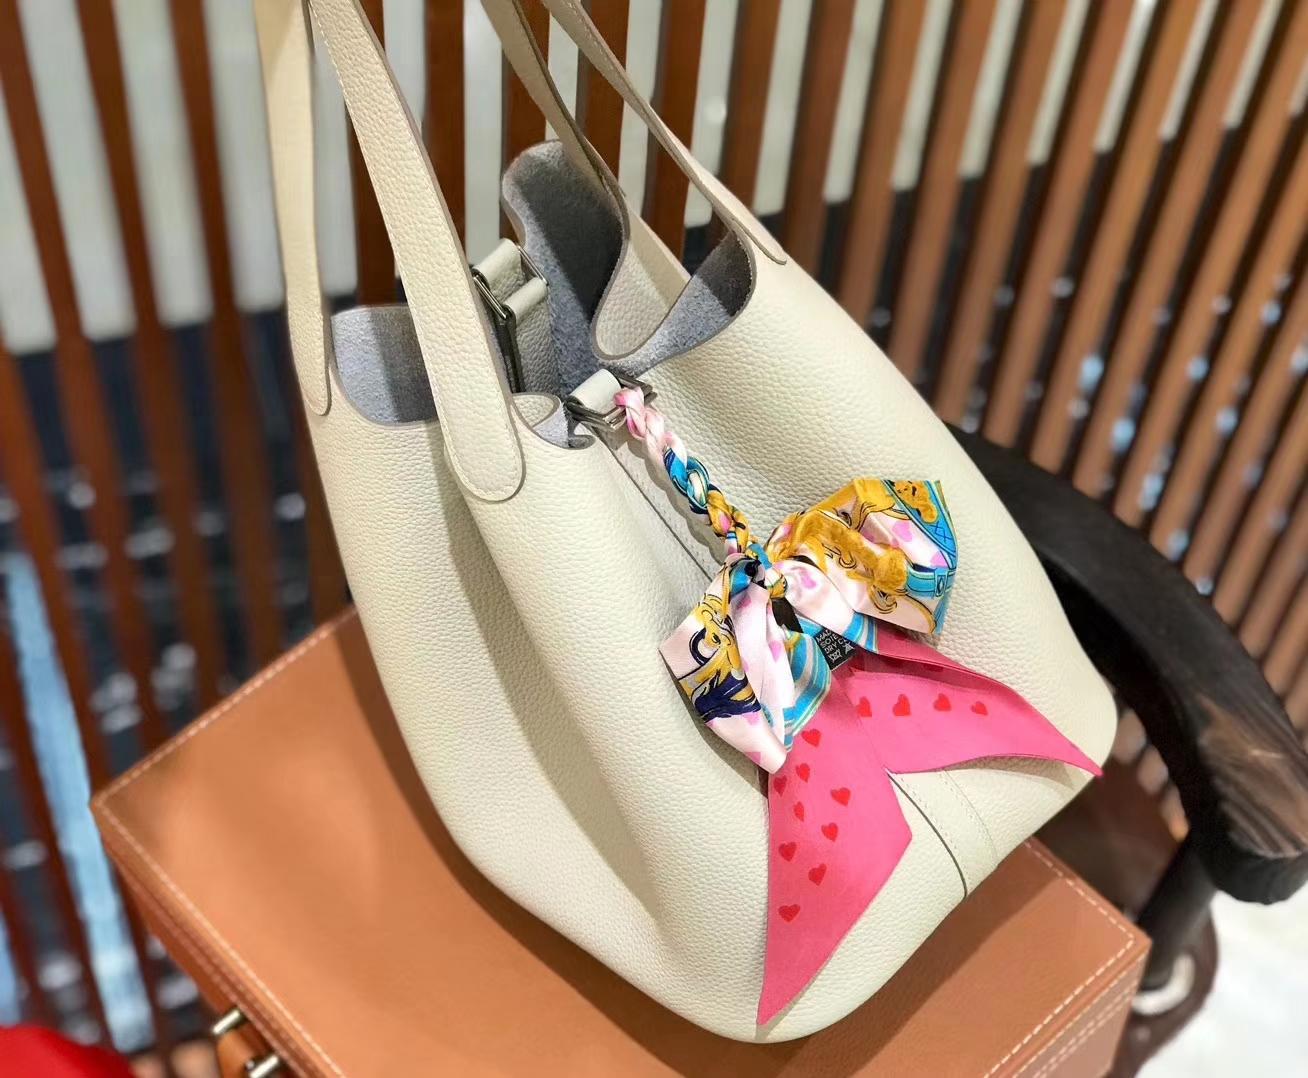 Hermès(爱马仕)新增现货 Picotin 菜篮子 奶昔白 全手工蜡线缝制 银扣 22cm